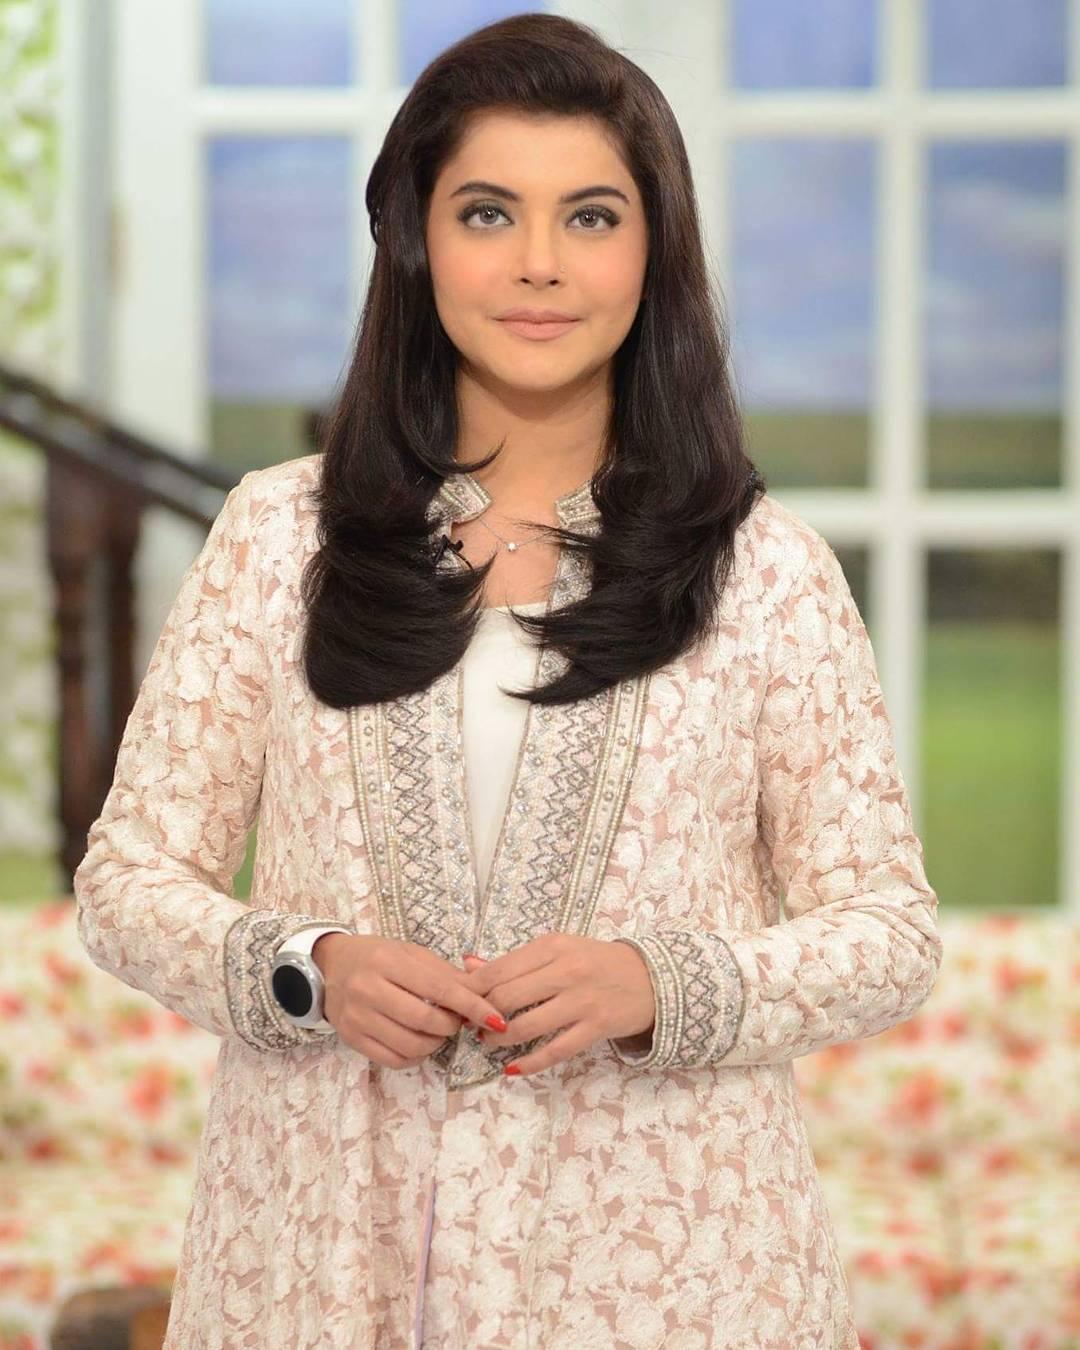 Curvy Pakistani Girls Fashion-30 Plus Size Outfits For Girls